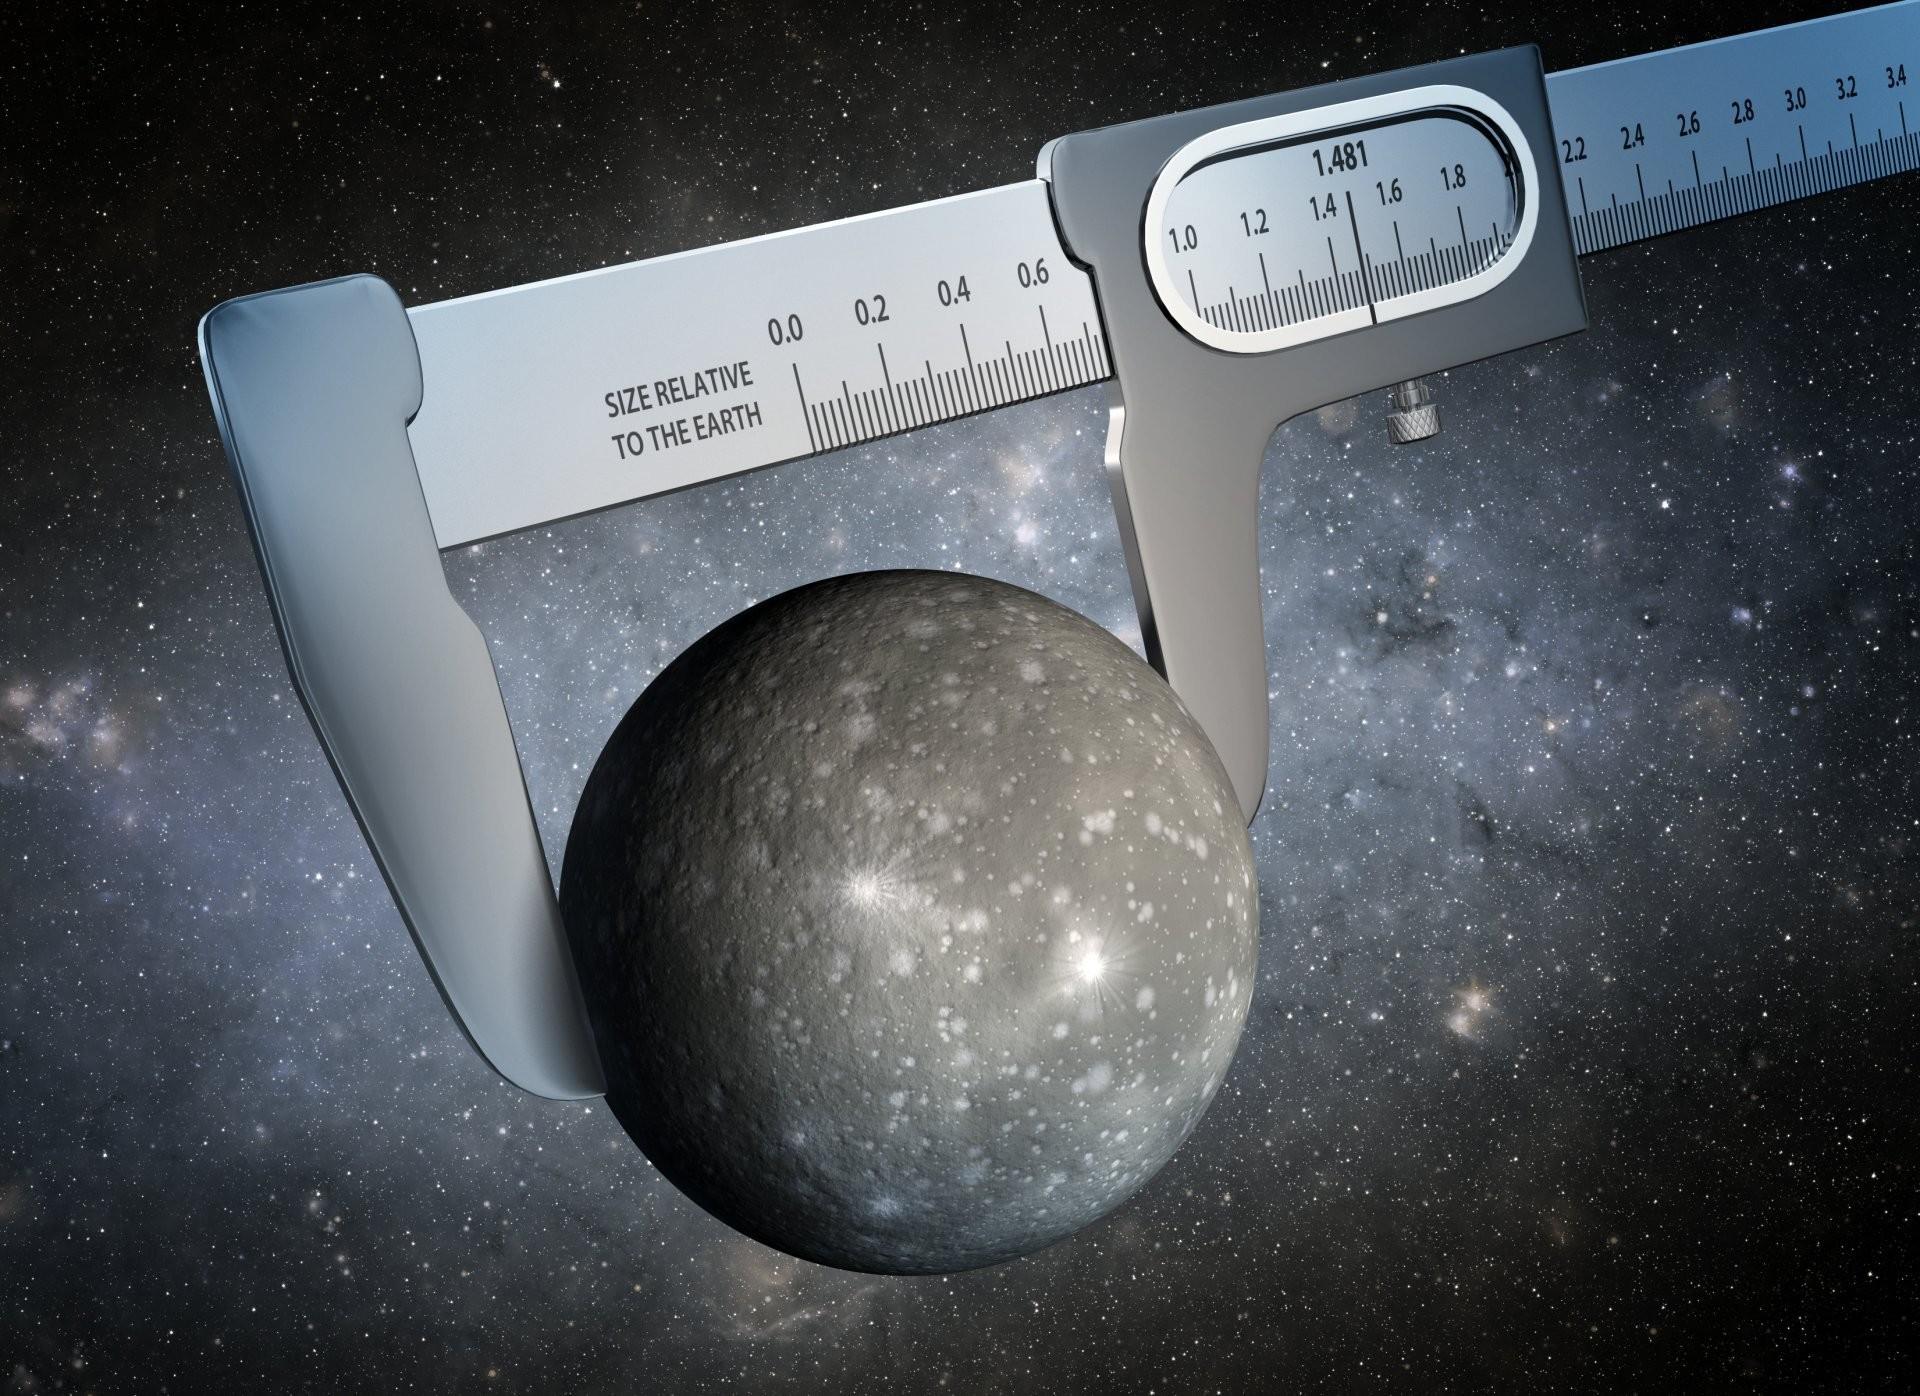 astrophysics physics gauge tool planet